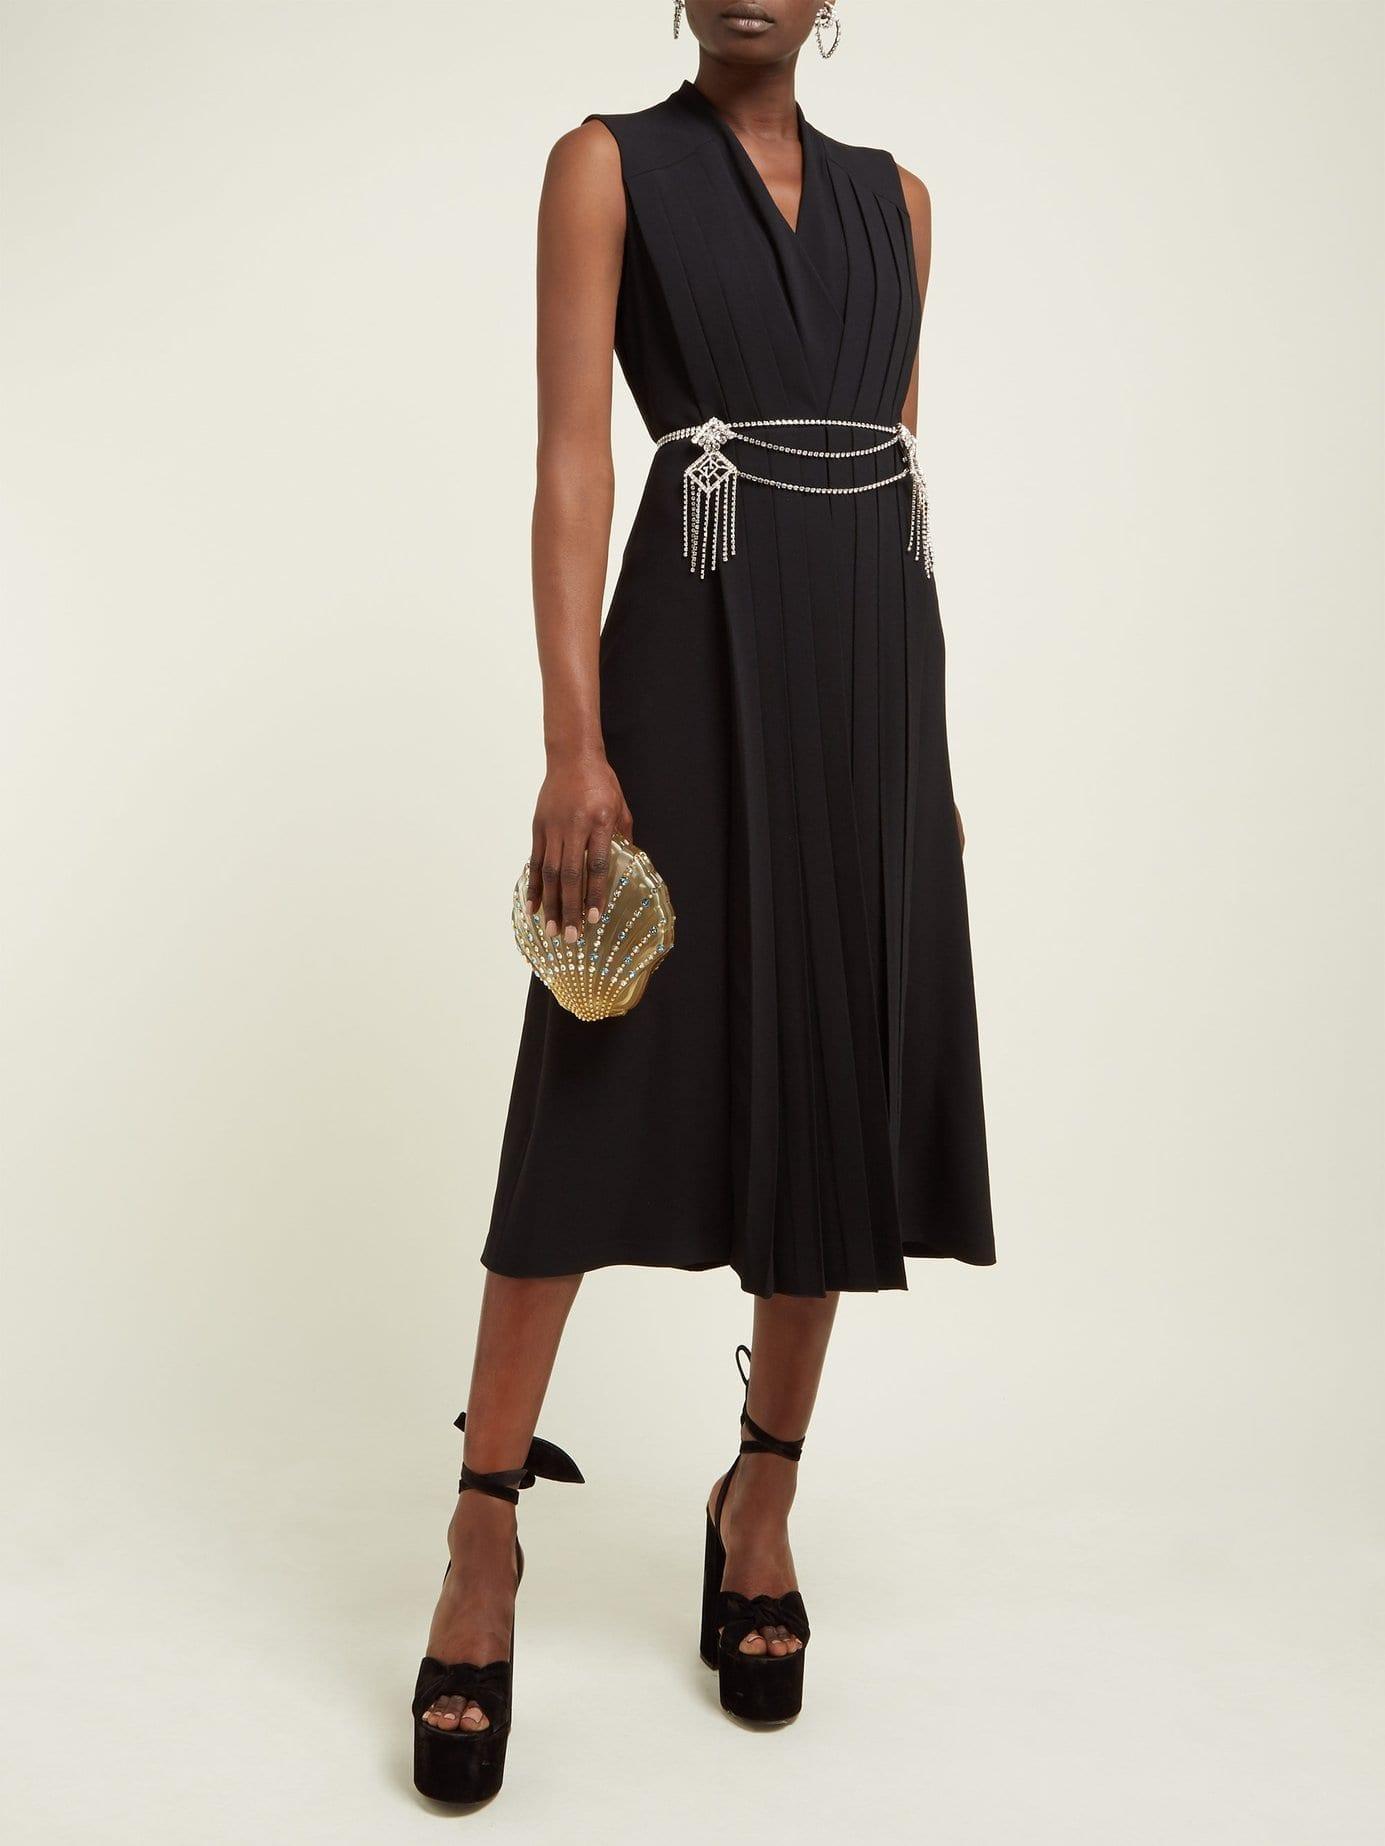 7fbd2d363 GUCCI Crystal Embellished Pleated Cady Midi Black Dress - We Select ...